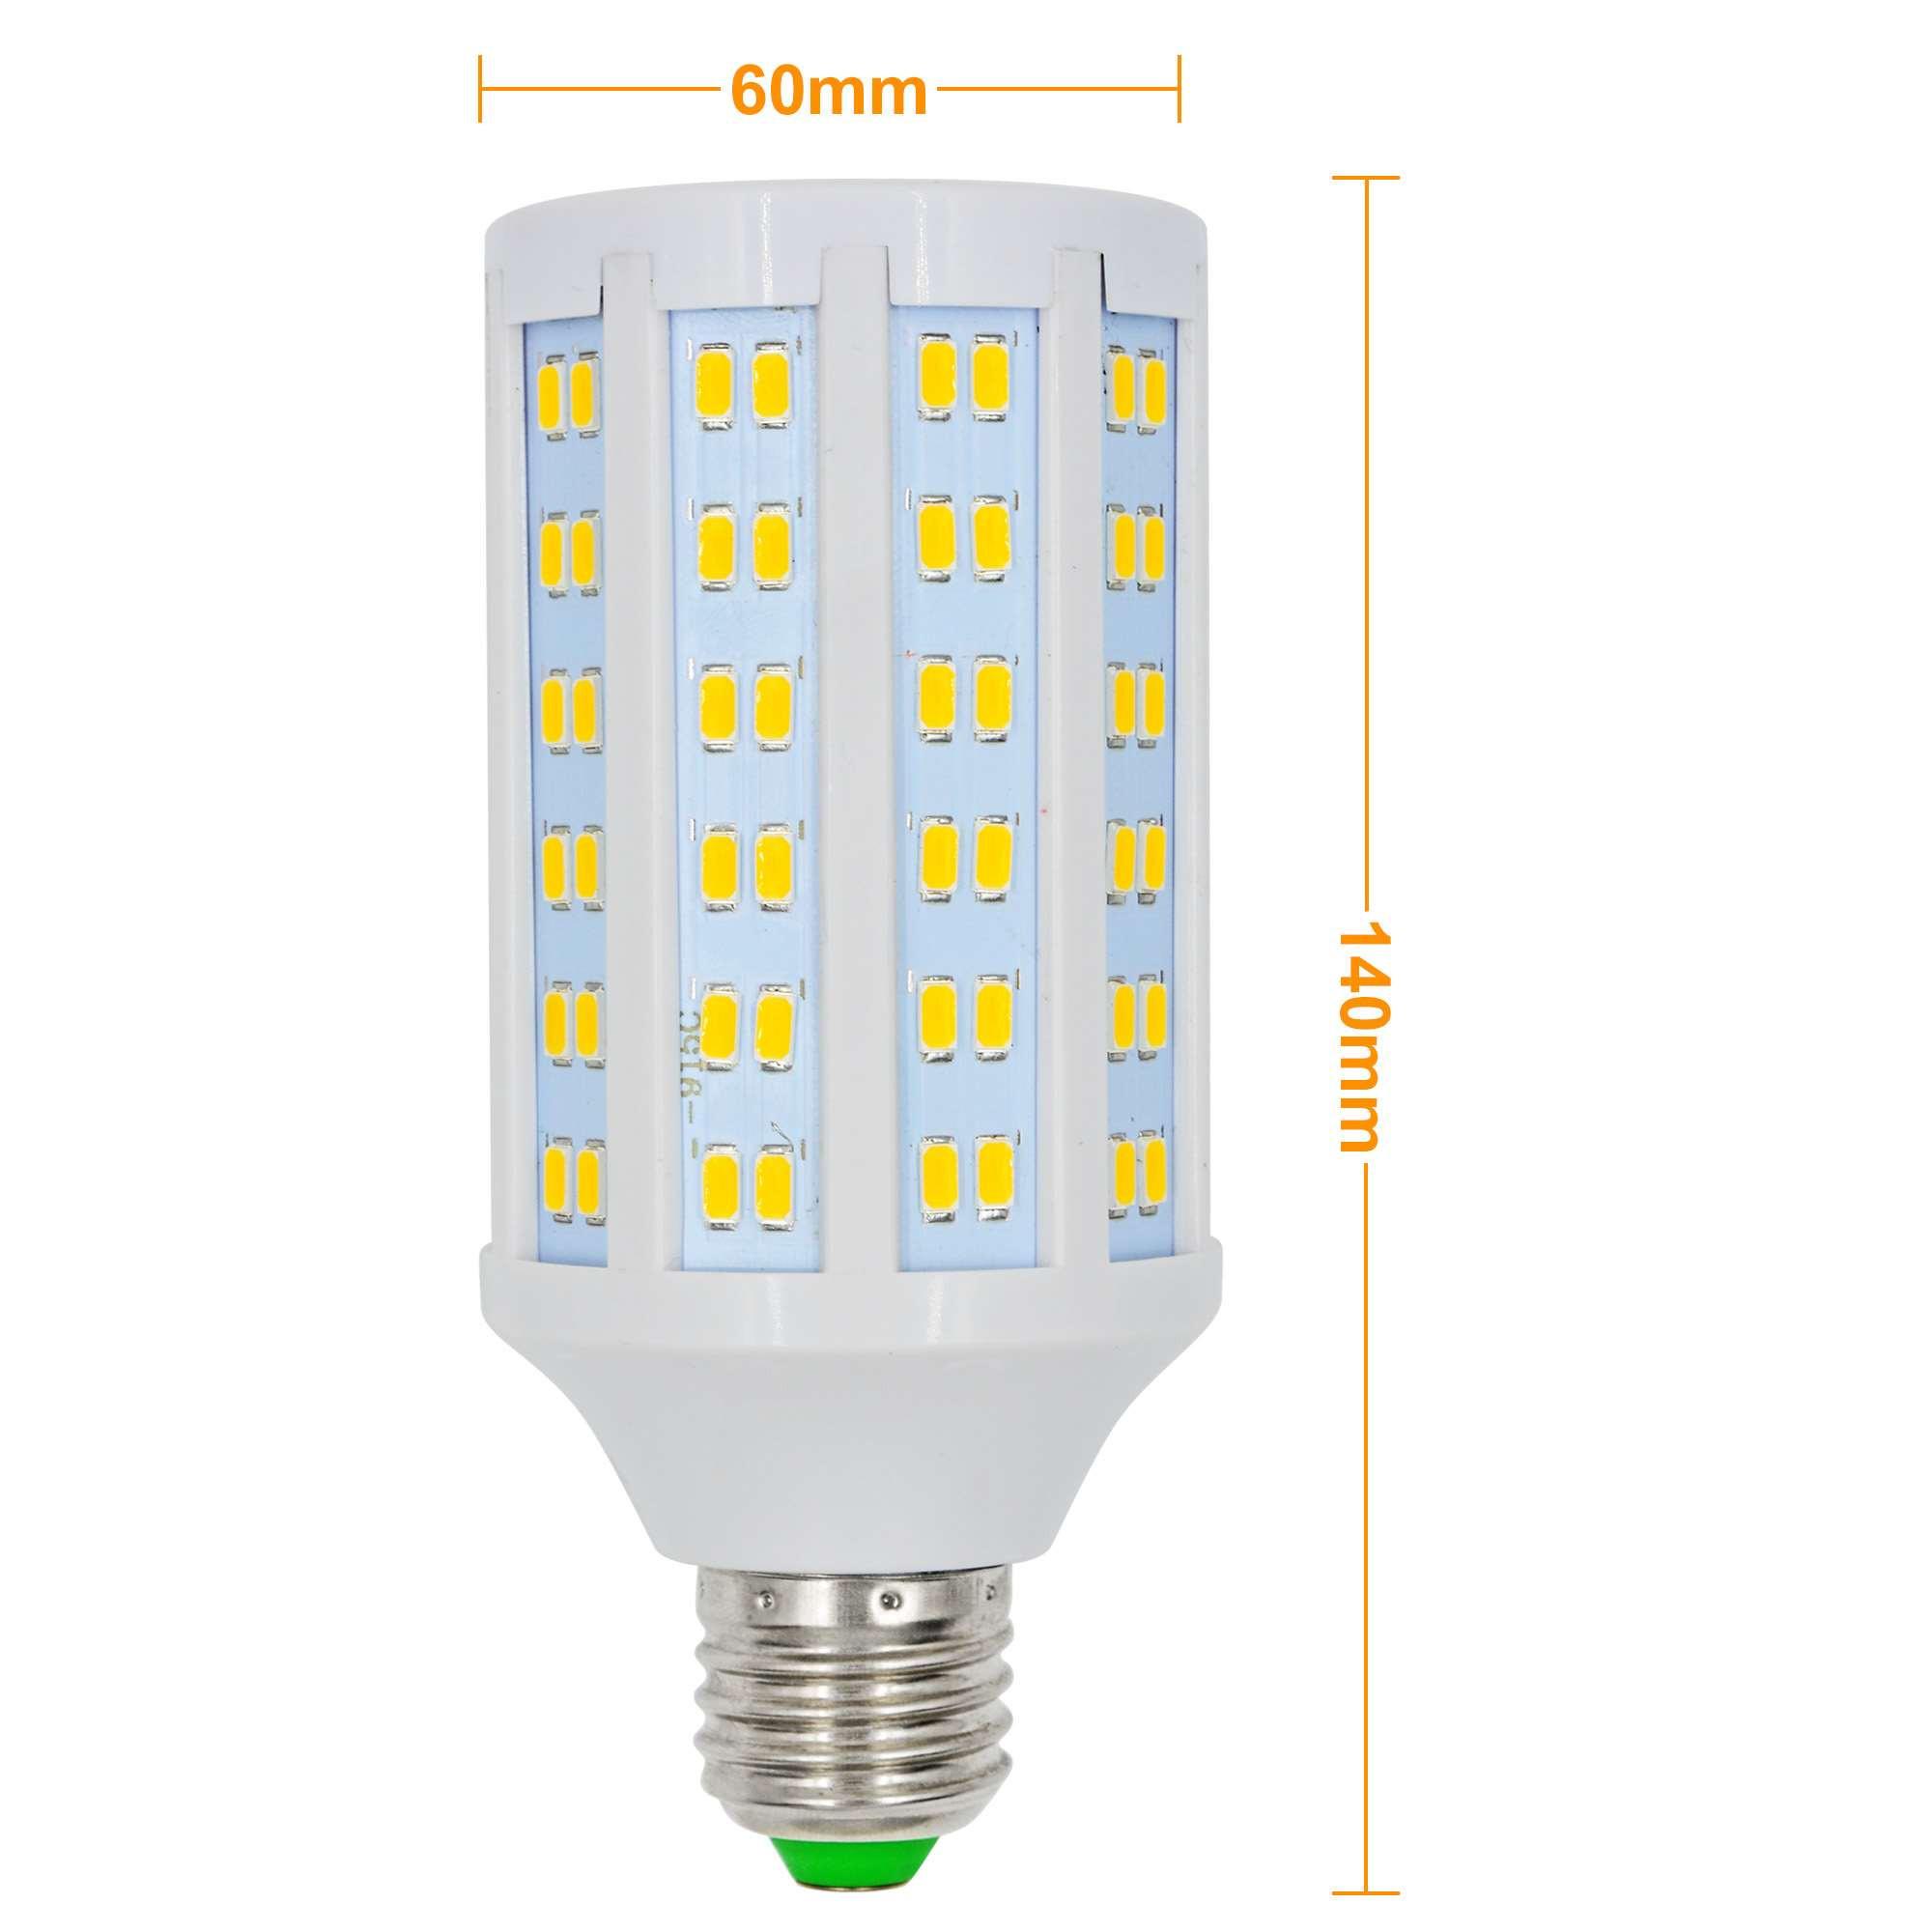 e27 20w led dimmable corn light 144x 5730 smd led bulb lamp ac 85 265v in warm white energy. Black Bedroom Furniture Sets. Home Design Ideas